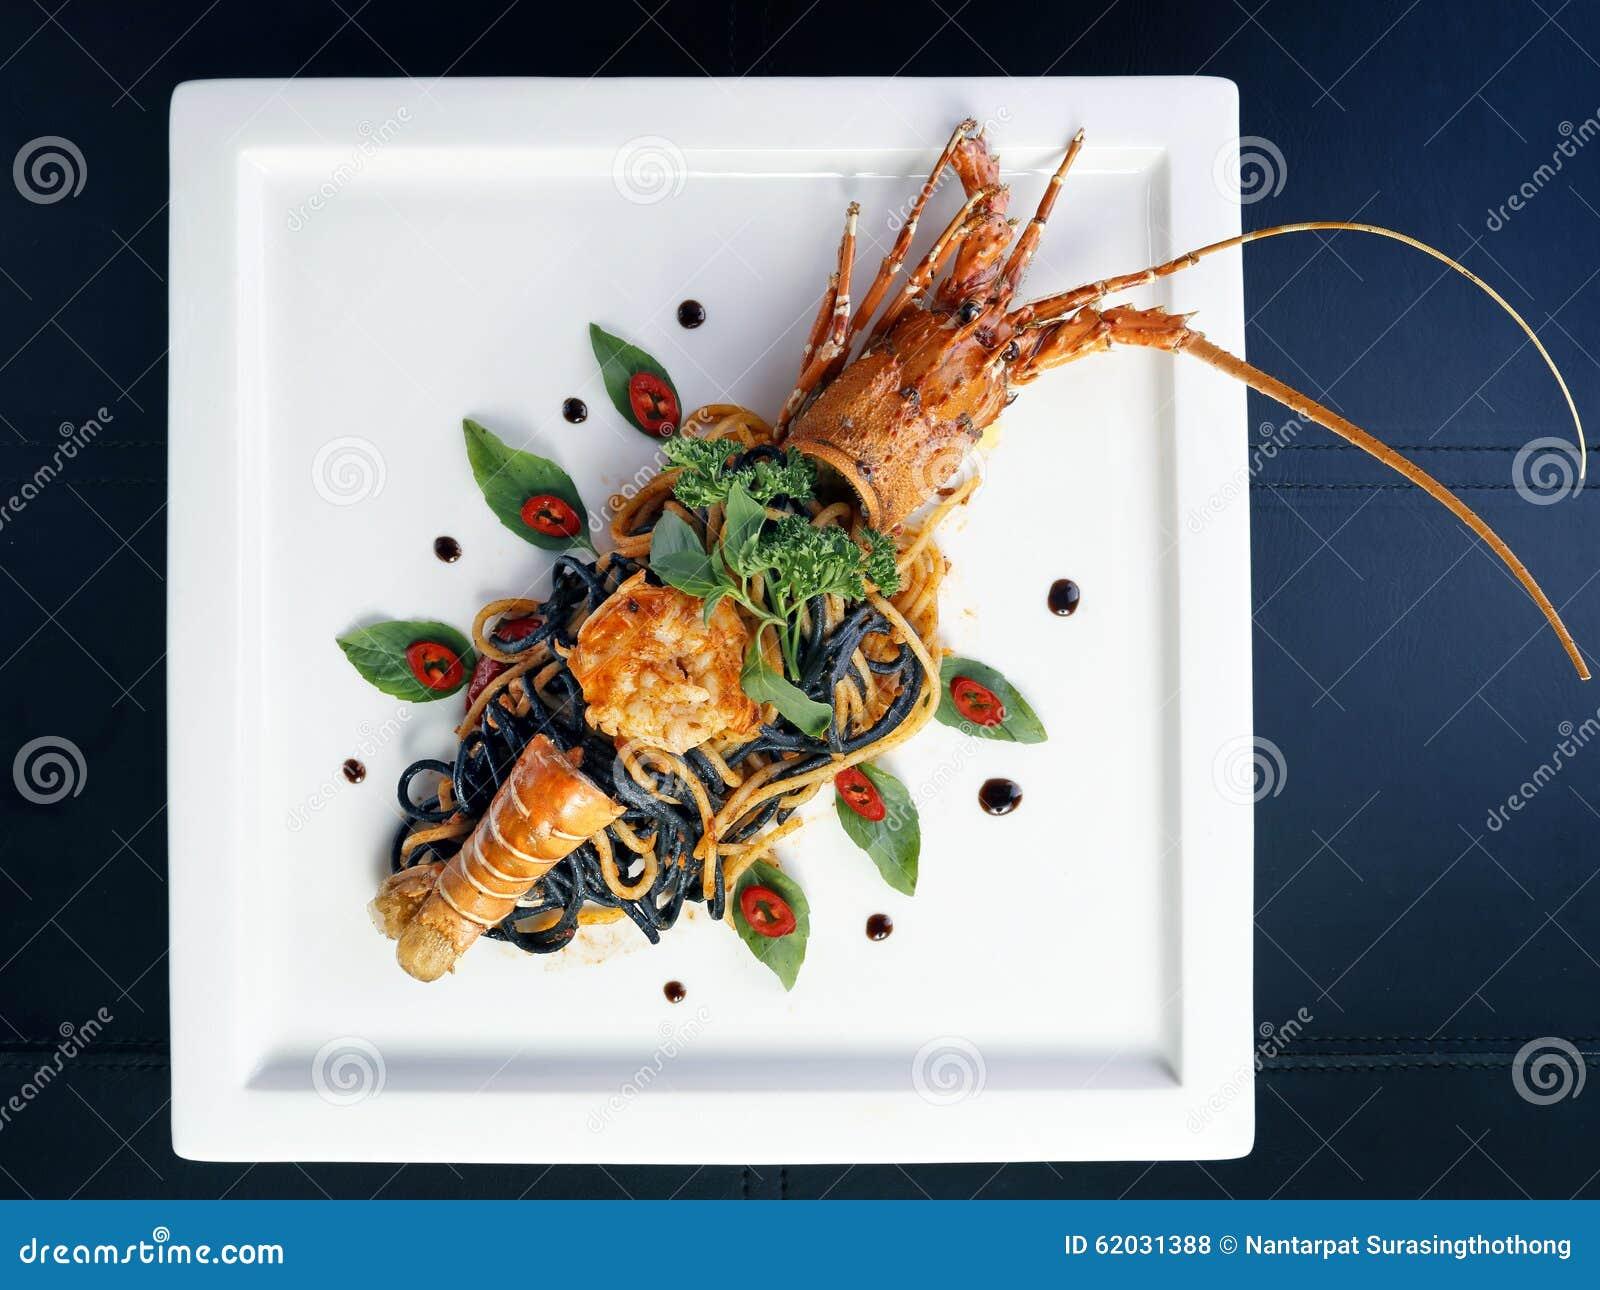 Lobster Spaghetti, Italian Cuisine Royalty-Free Stock Image | CartoonDealer.com #80958400